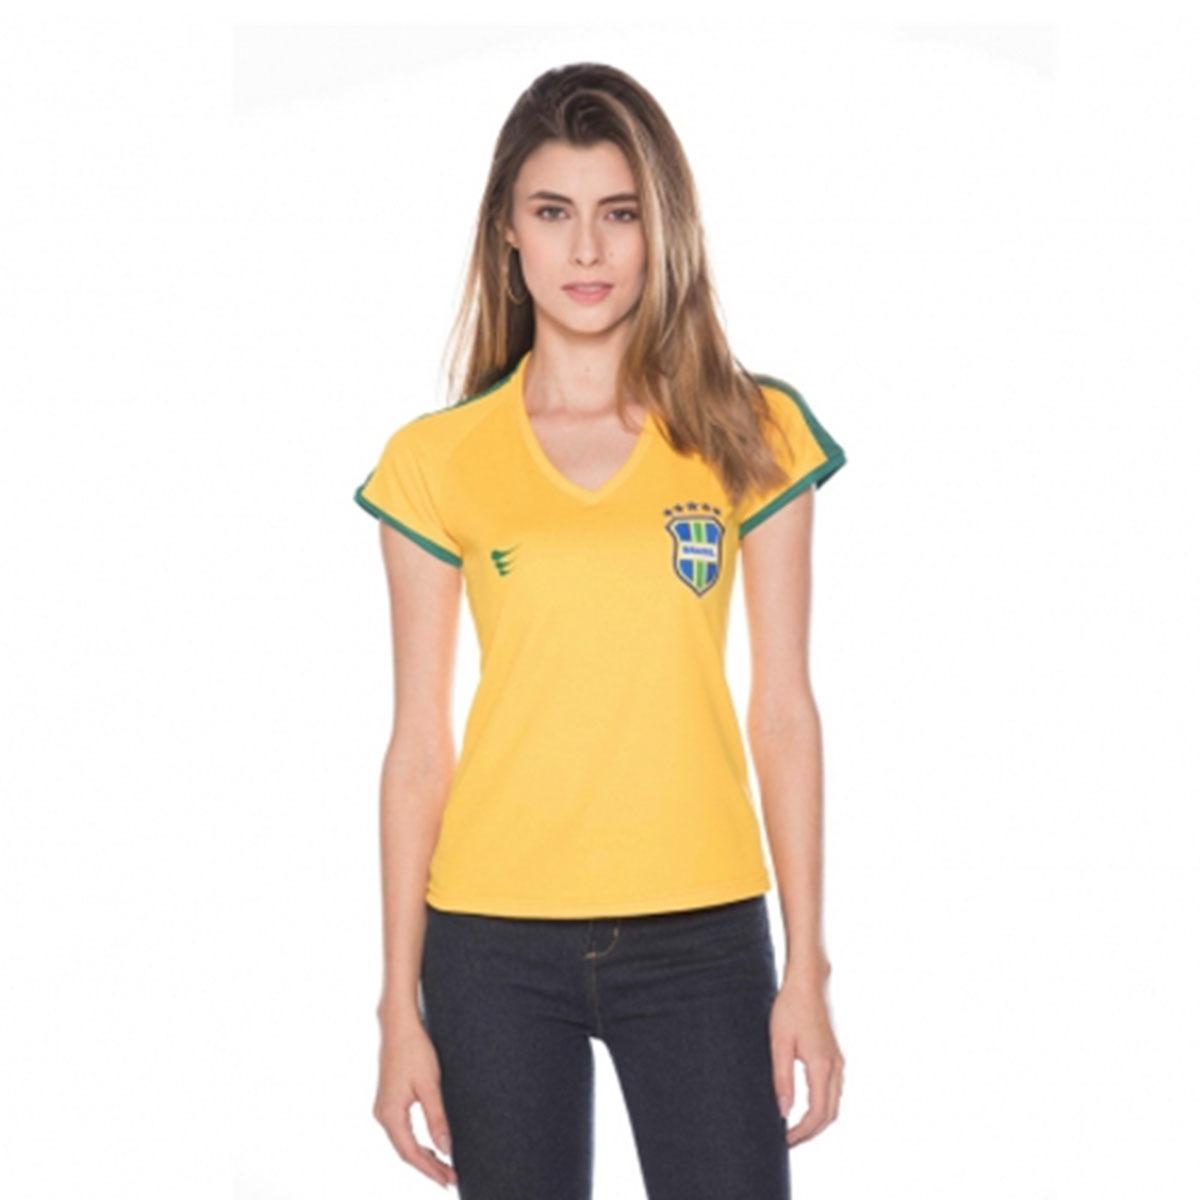 f28fdf9fe8 Camisa Feminina Brasil Pro 2018 S nº - Super Bolla - Amarela - R  34 ...